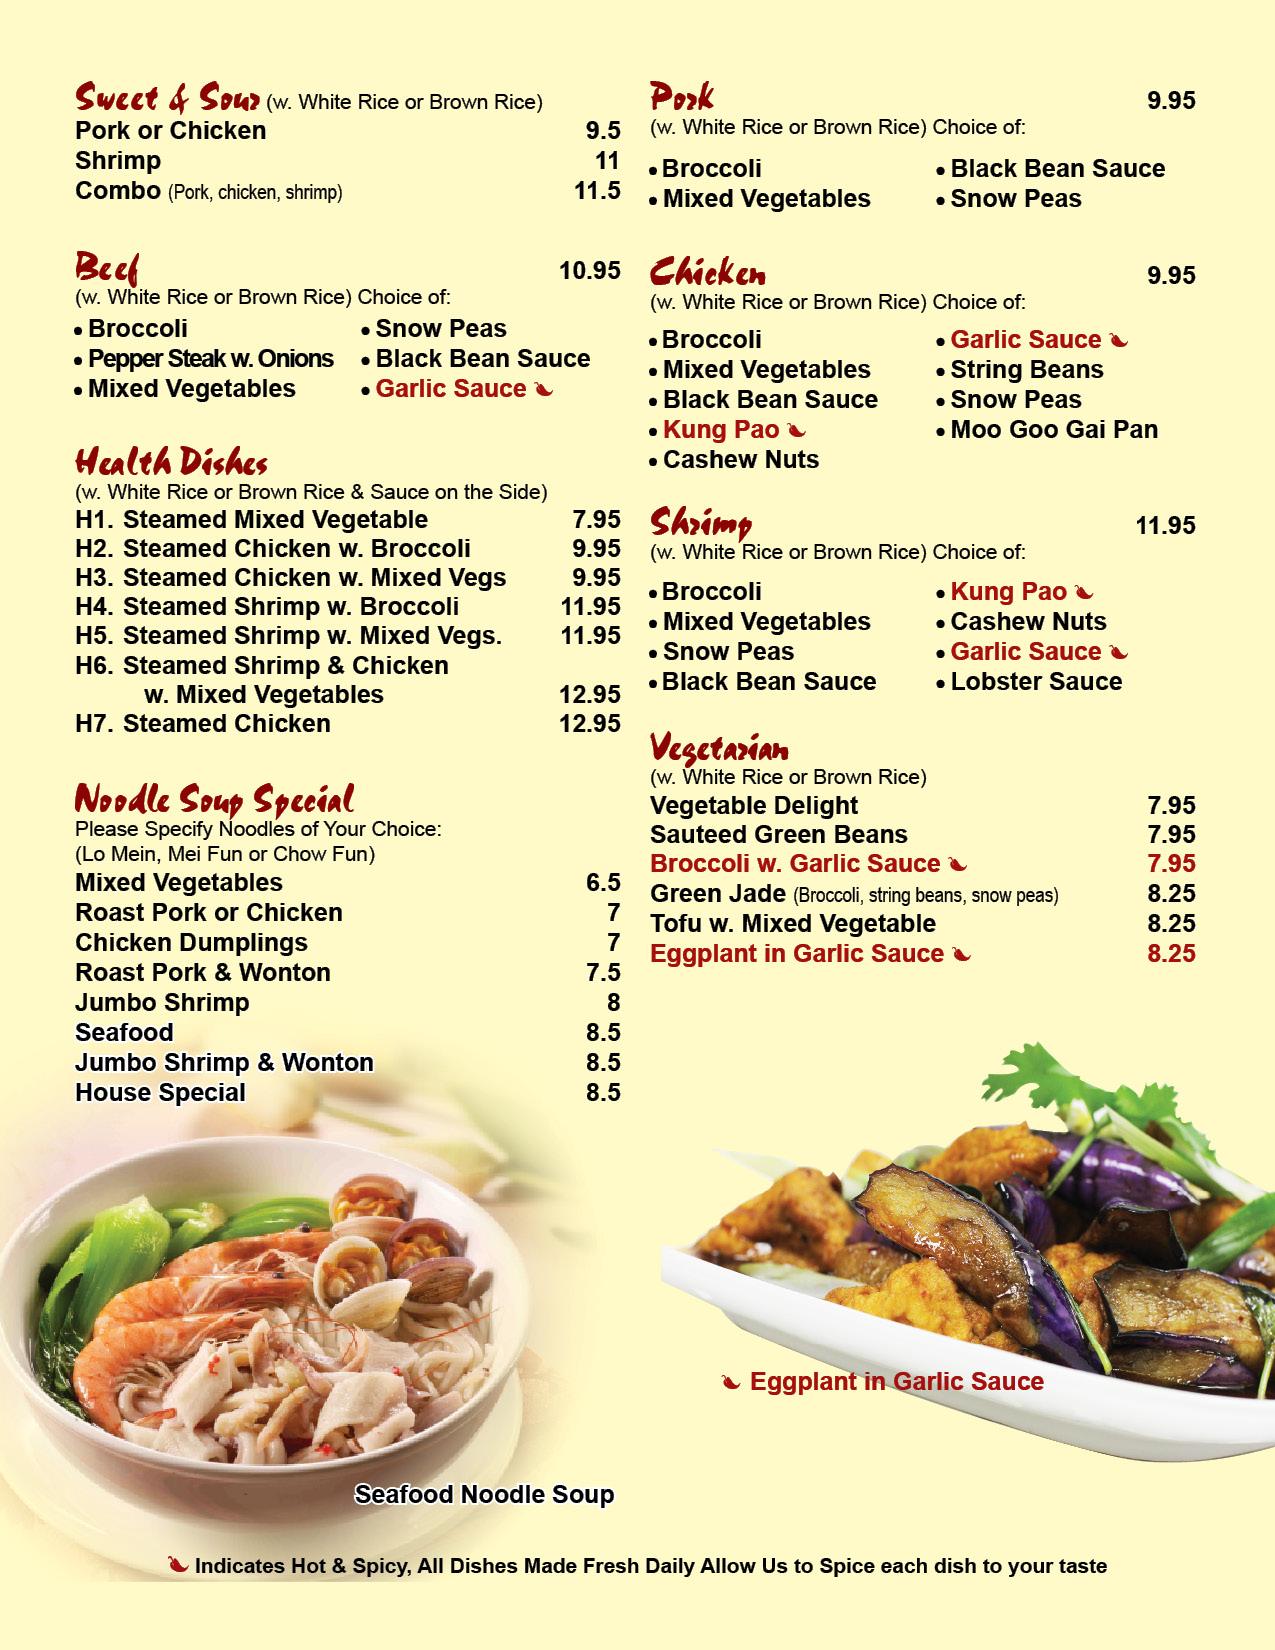 Dim asian fusion qx printing for Aura thai fusion cuisine new york ny